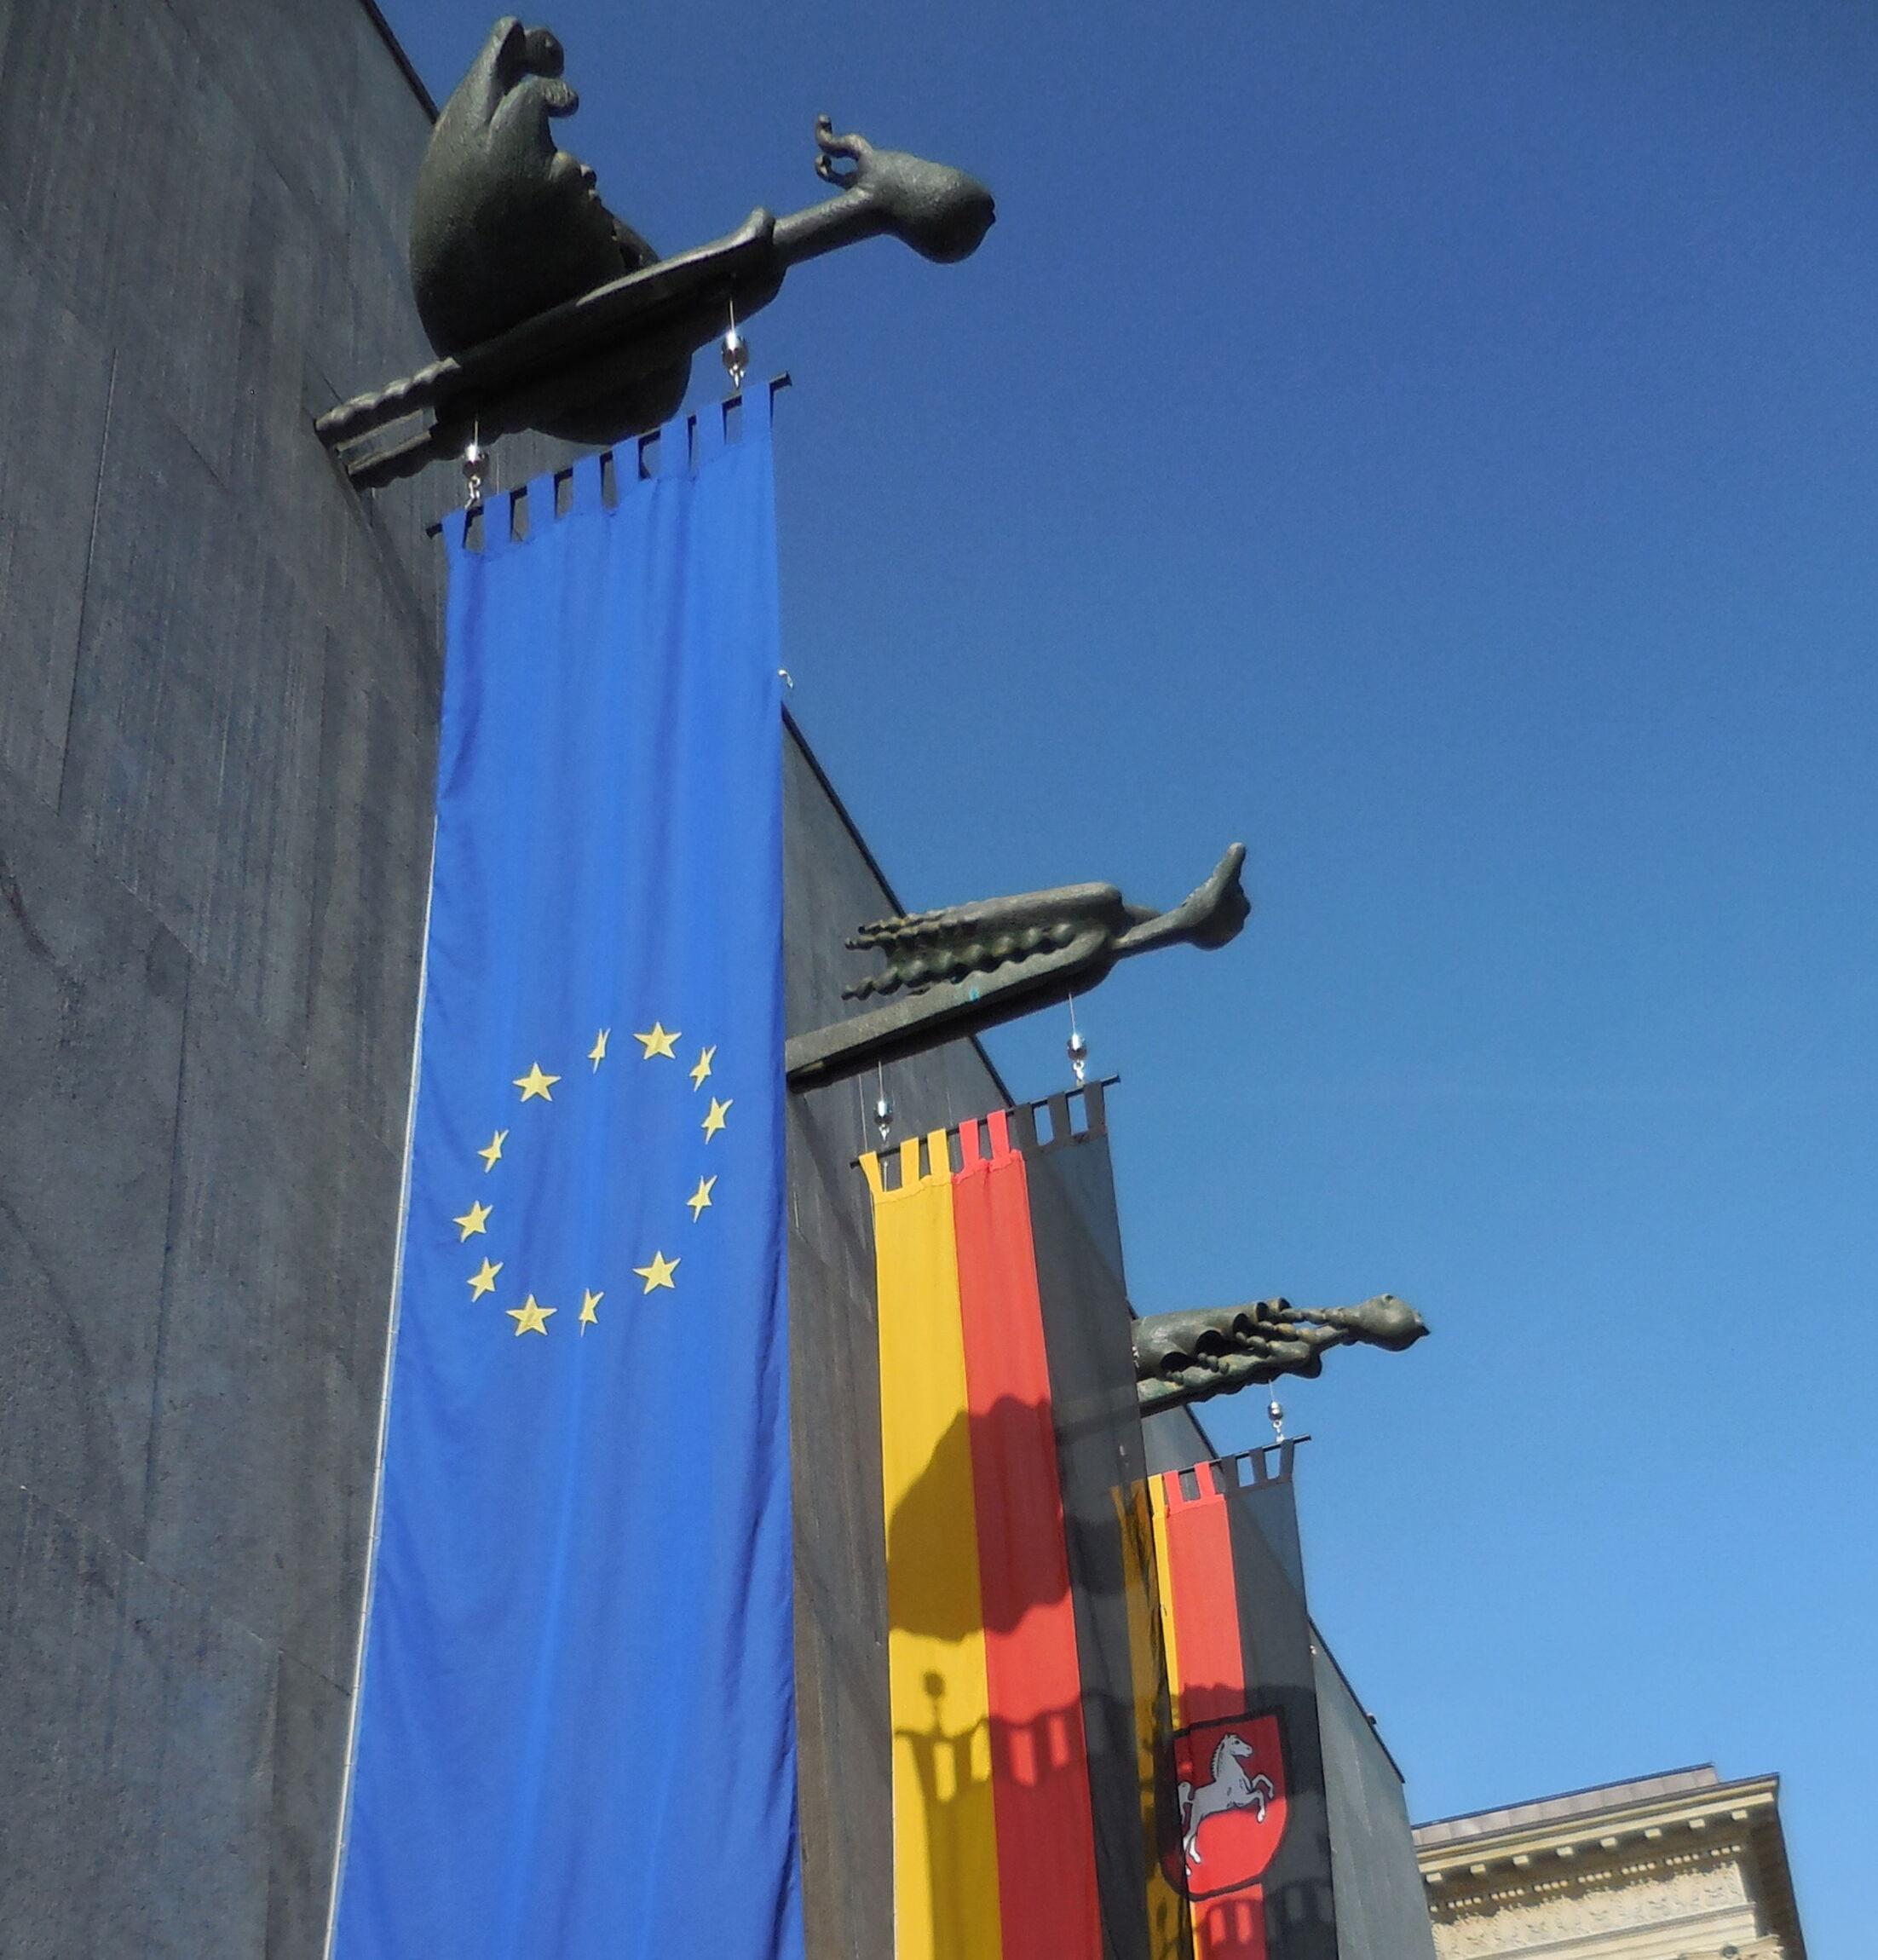 Plenarsitzung - Flaggen vor dem Landtag